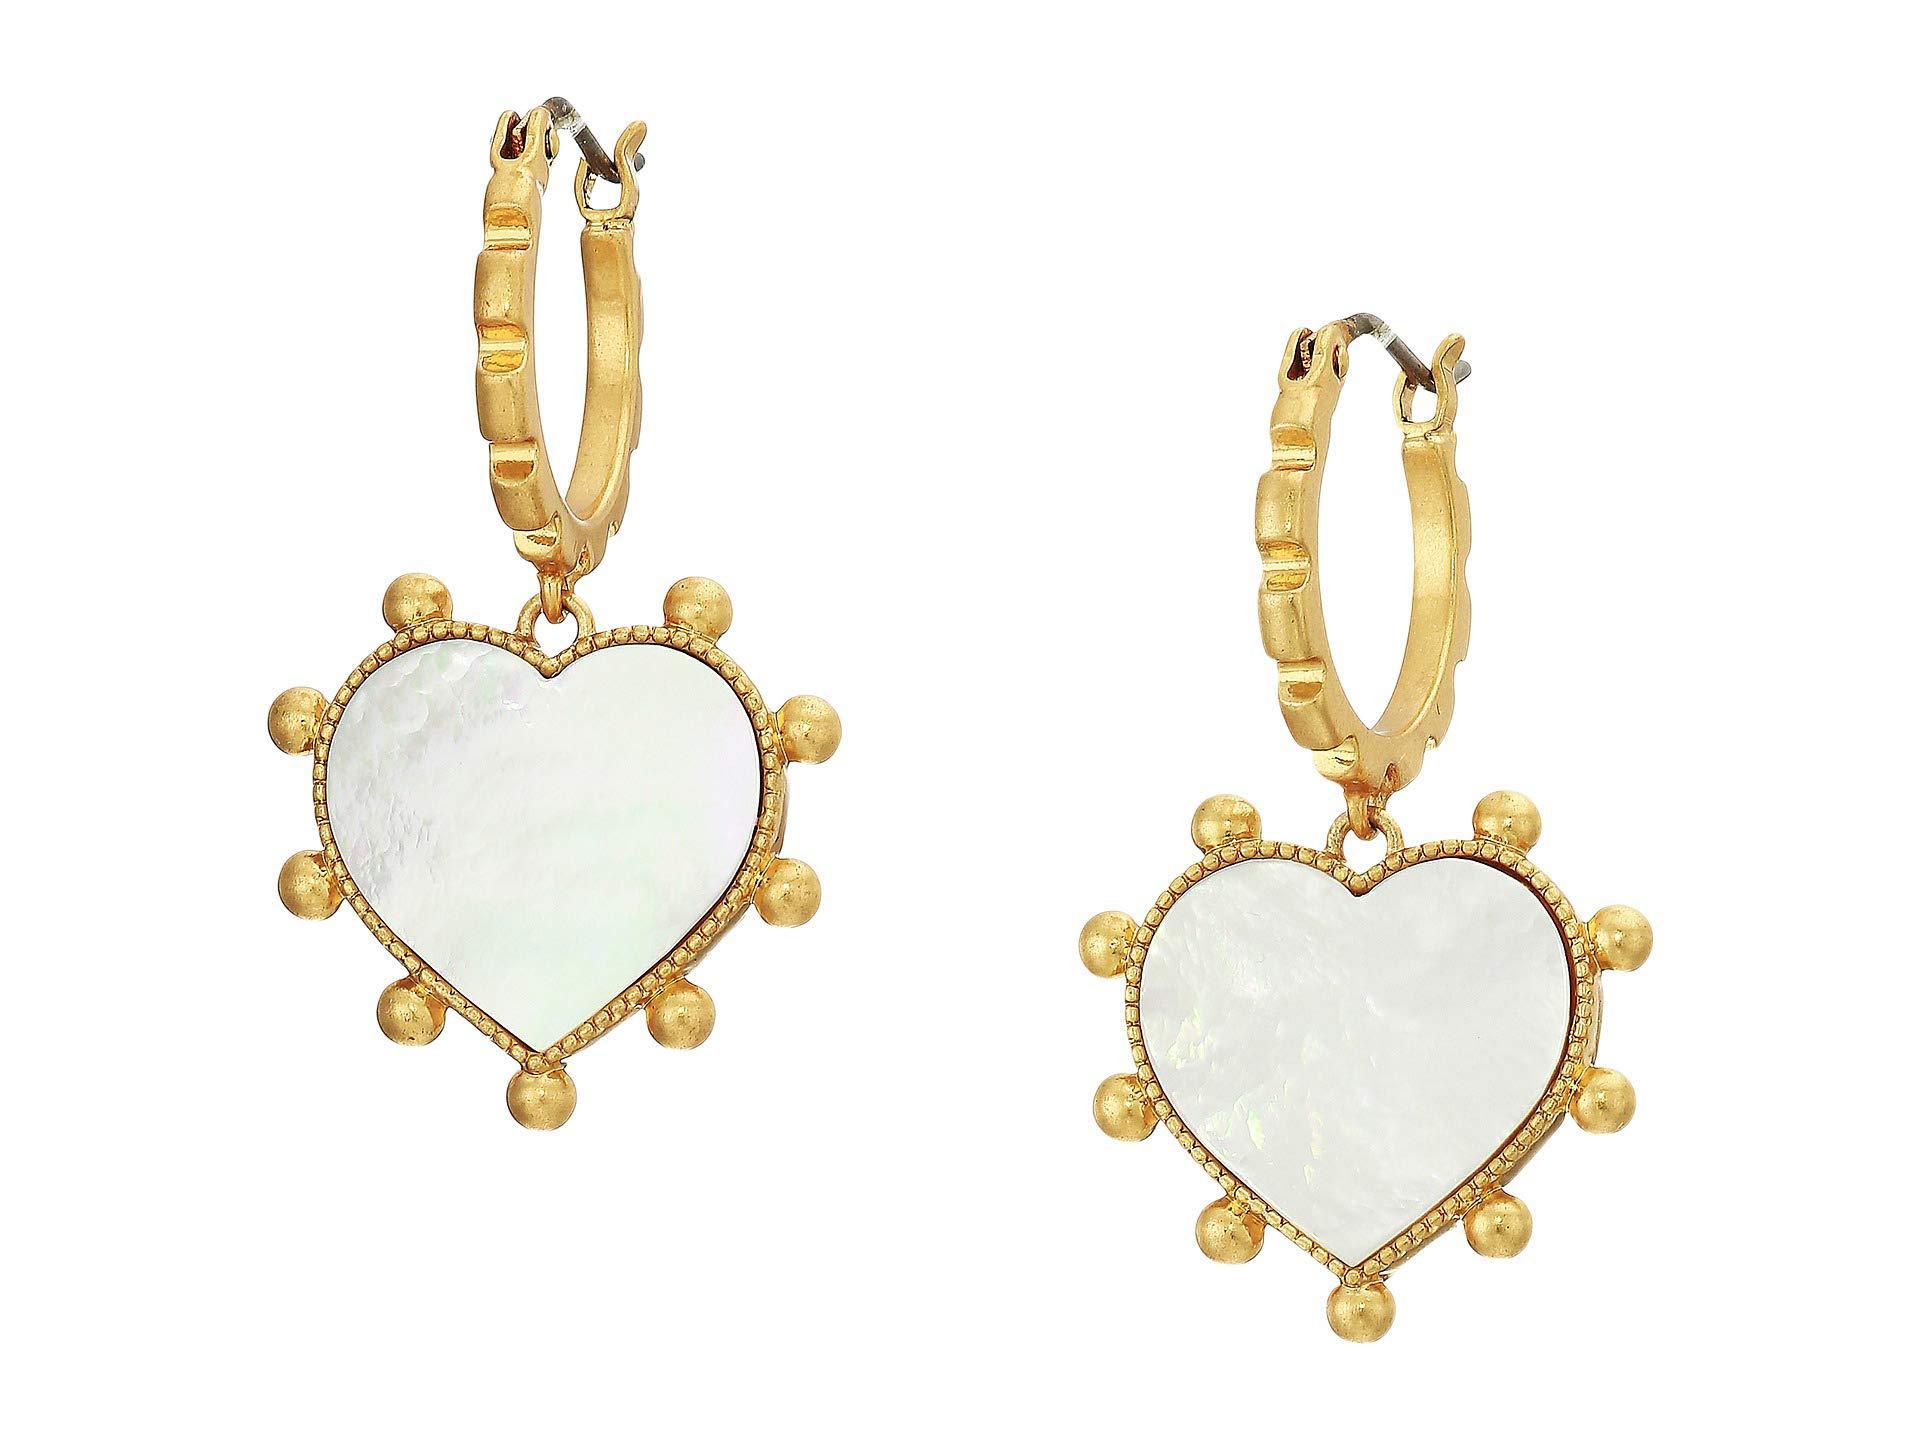 51233cf84 Tory Burch Semi-precious Heart Charm Earrings (vintage Gold/lapis ...